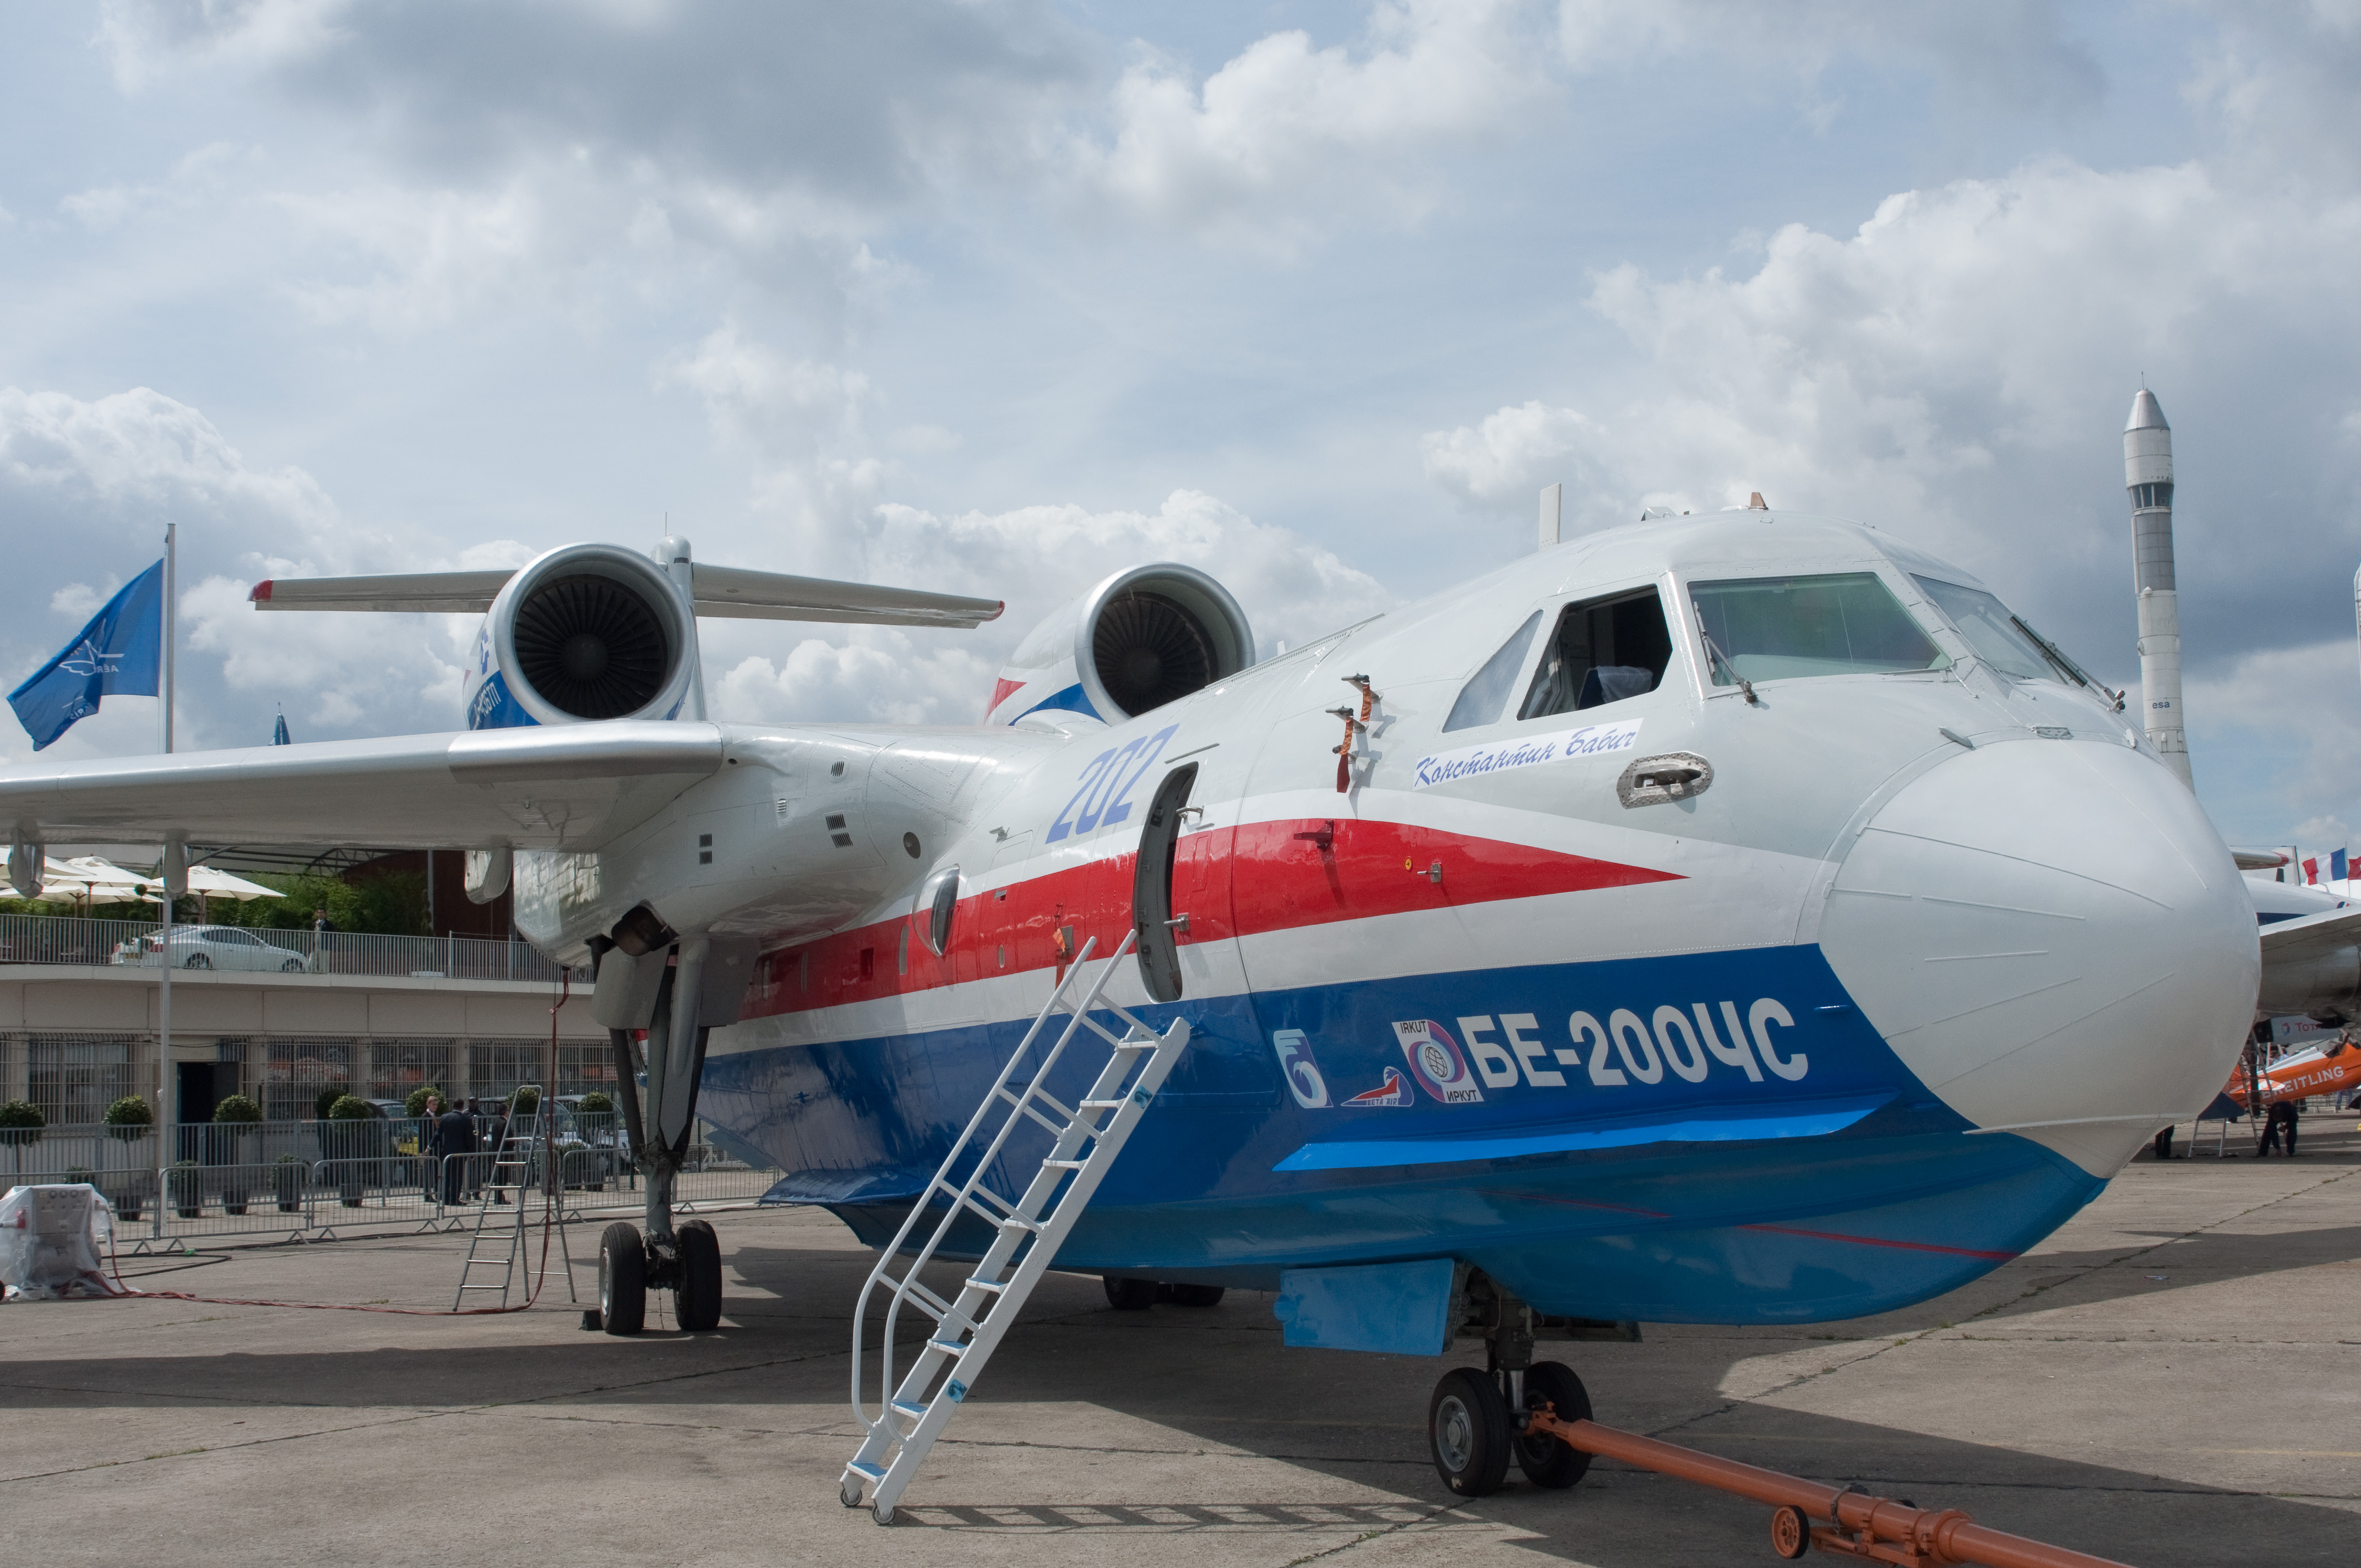 File:Beriev Be-200 Le Bourget 20110624.jpg - Wikimedia Commons